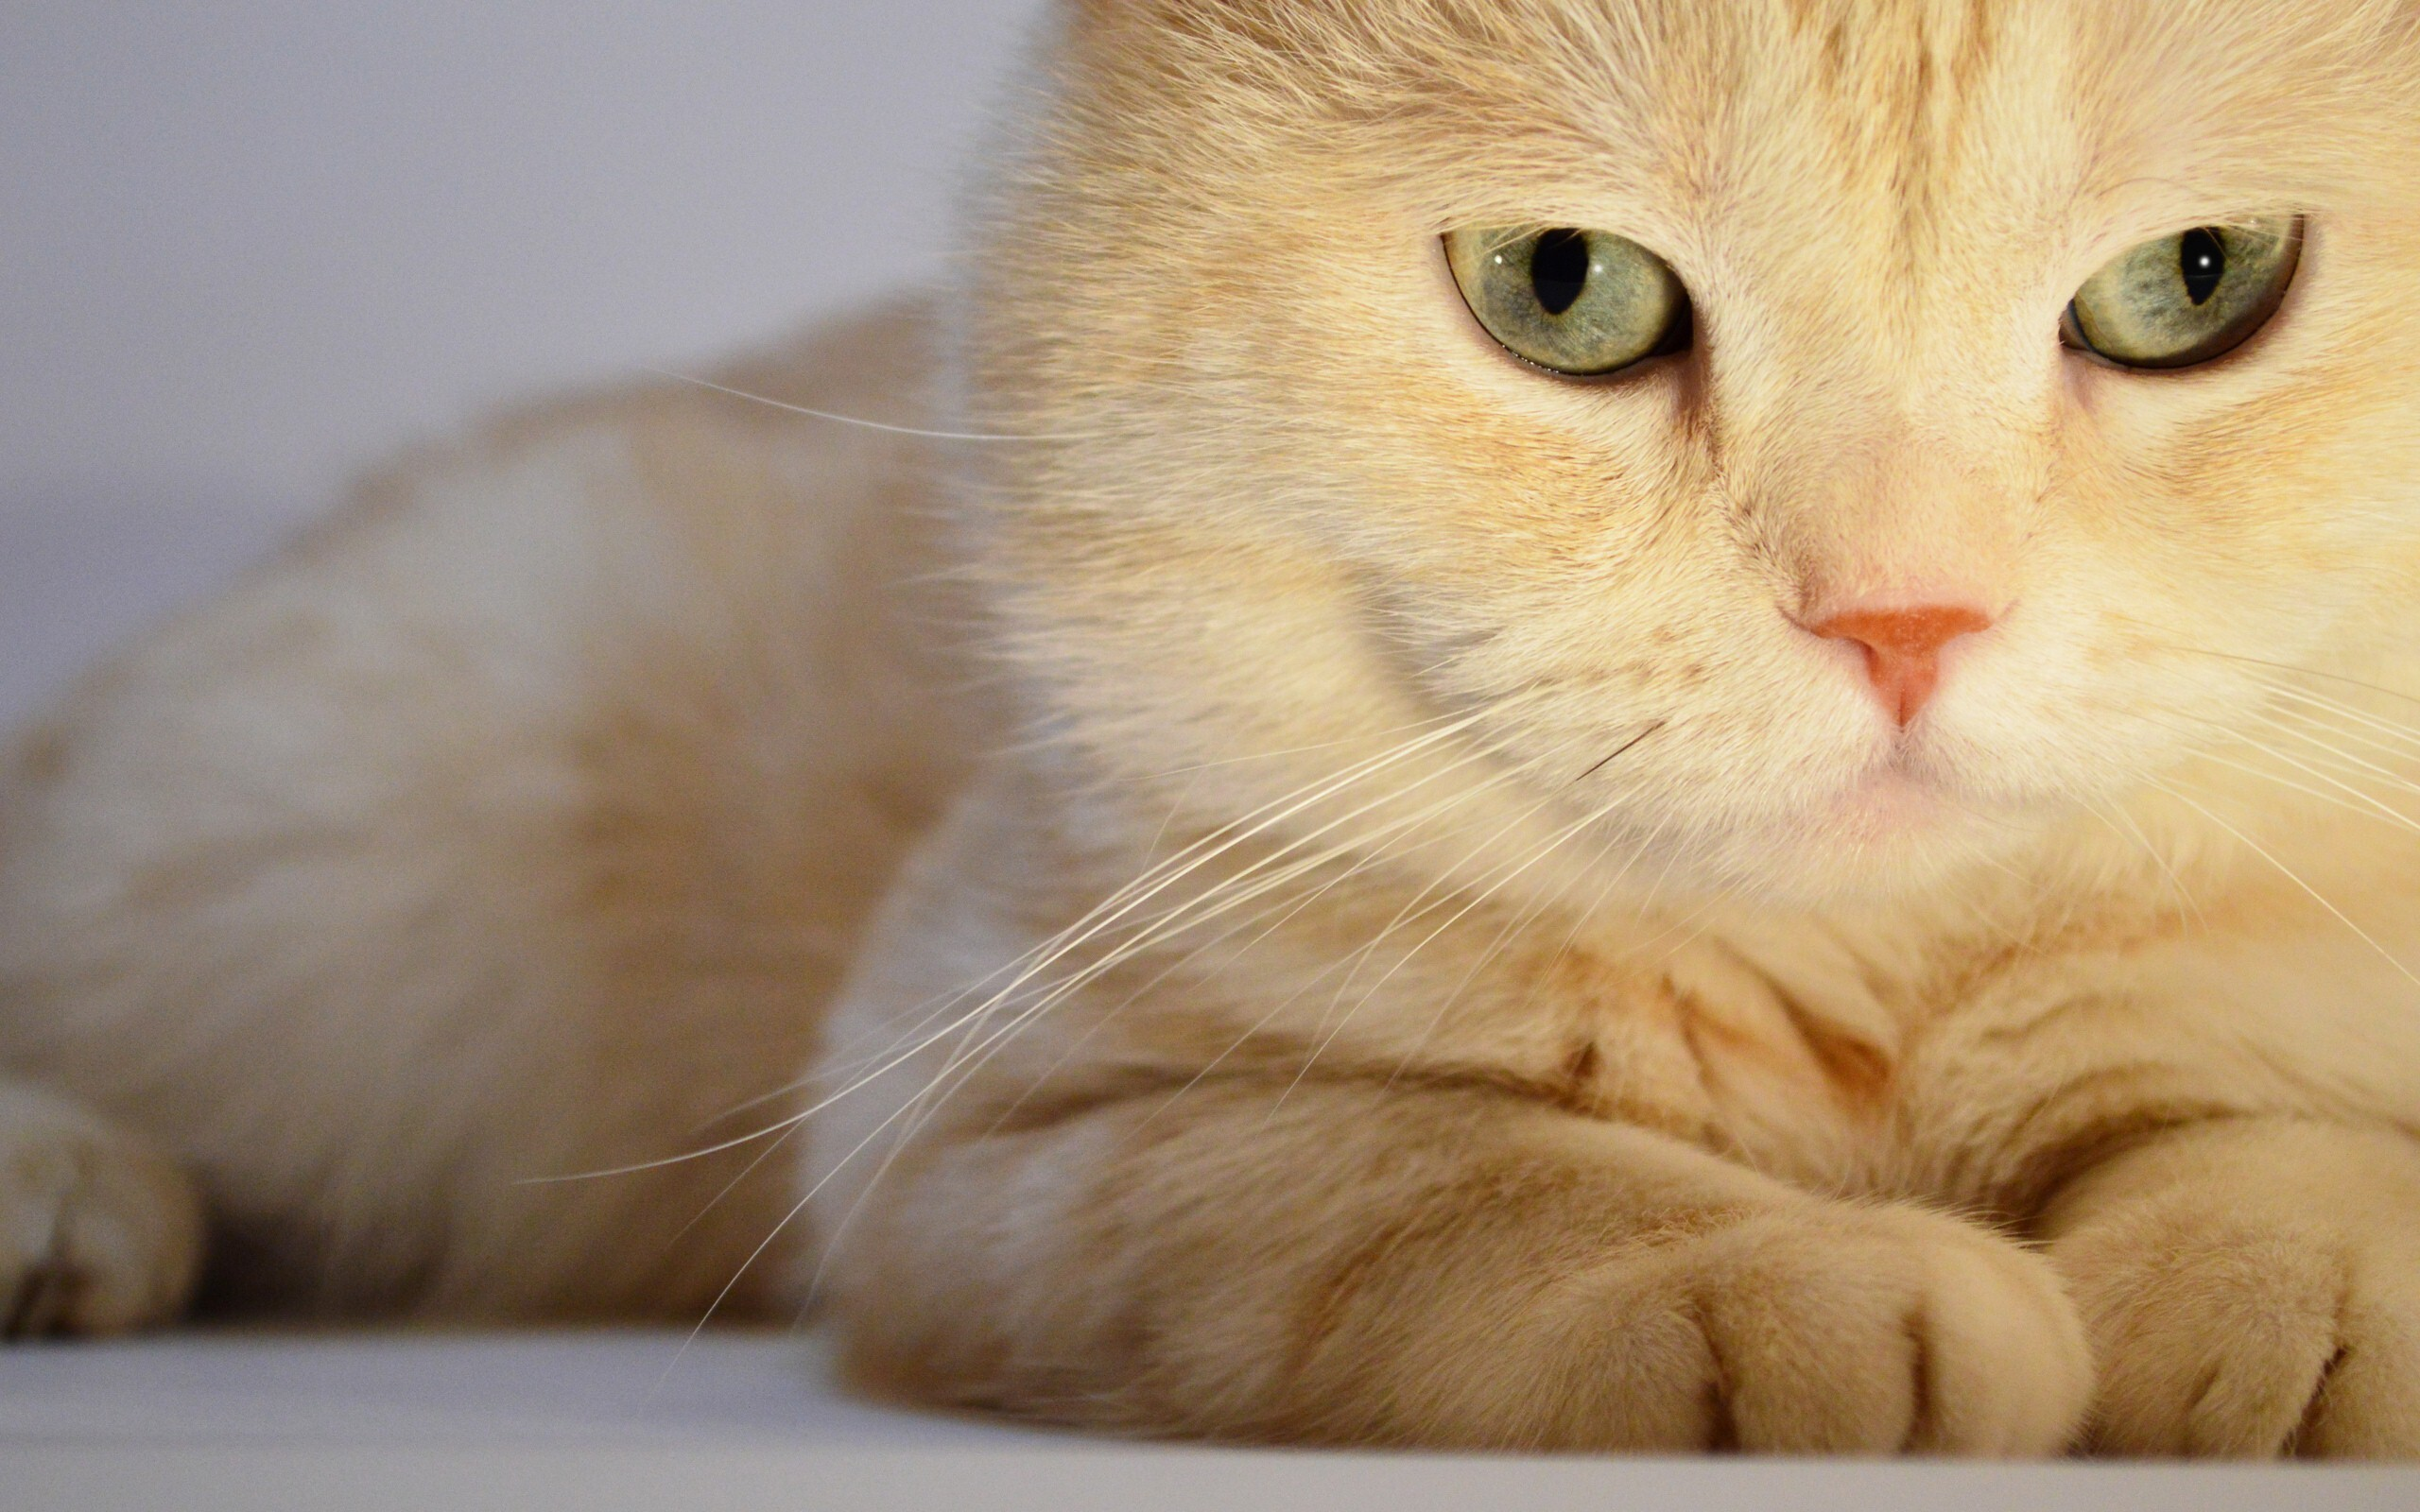 8k Animal Wallpaper Download: Yellow Cat Wonderful Wallpaper